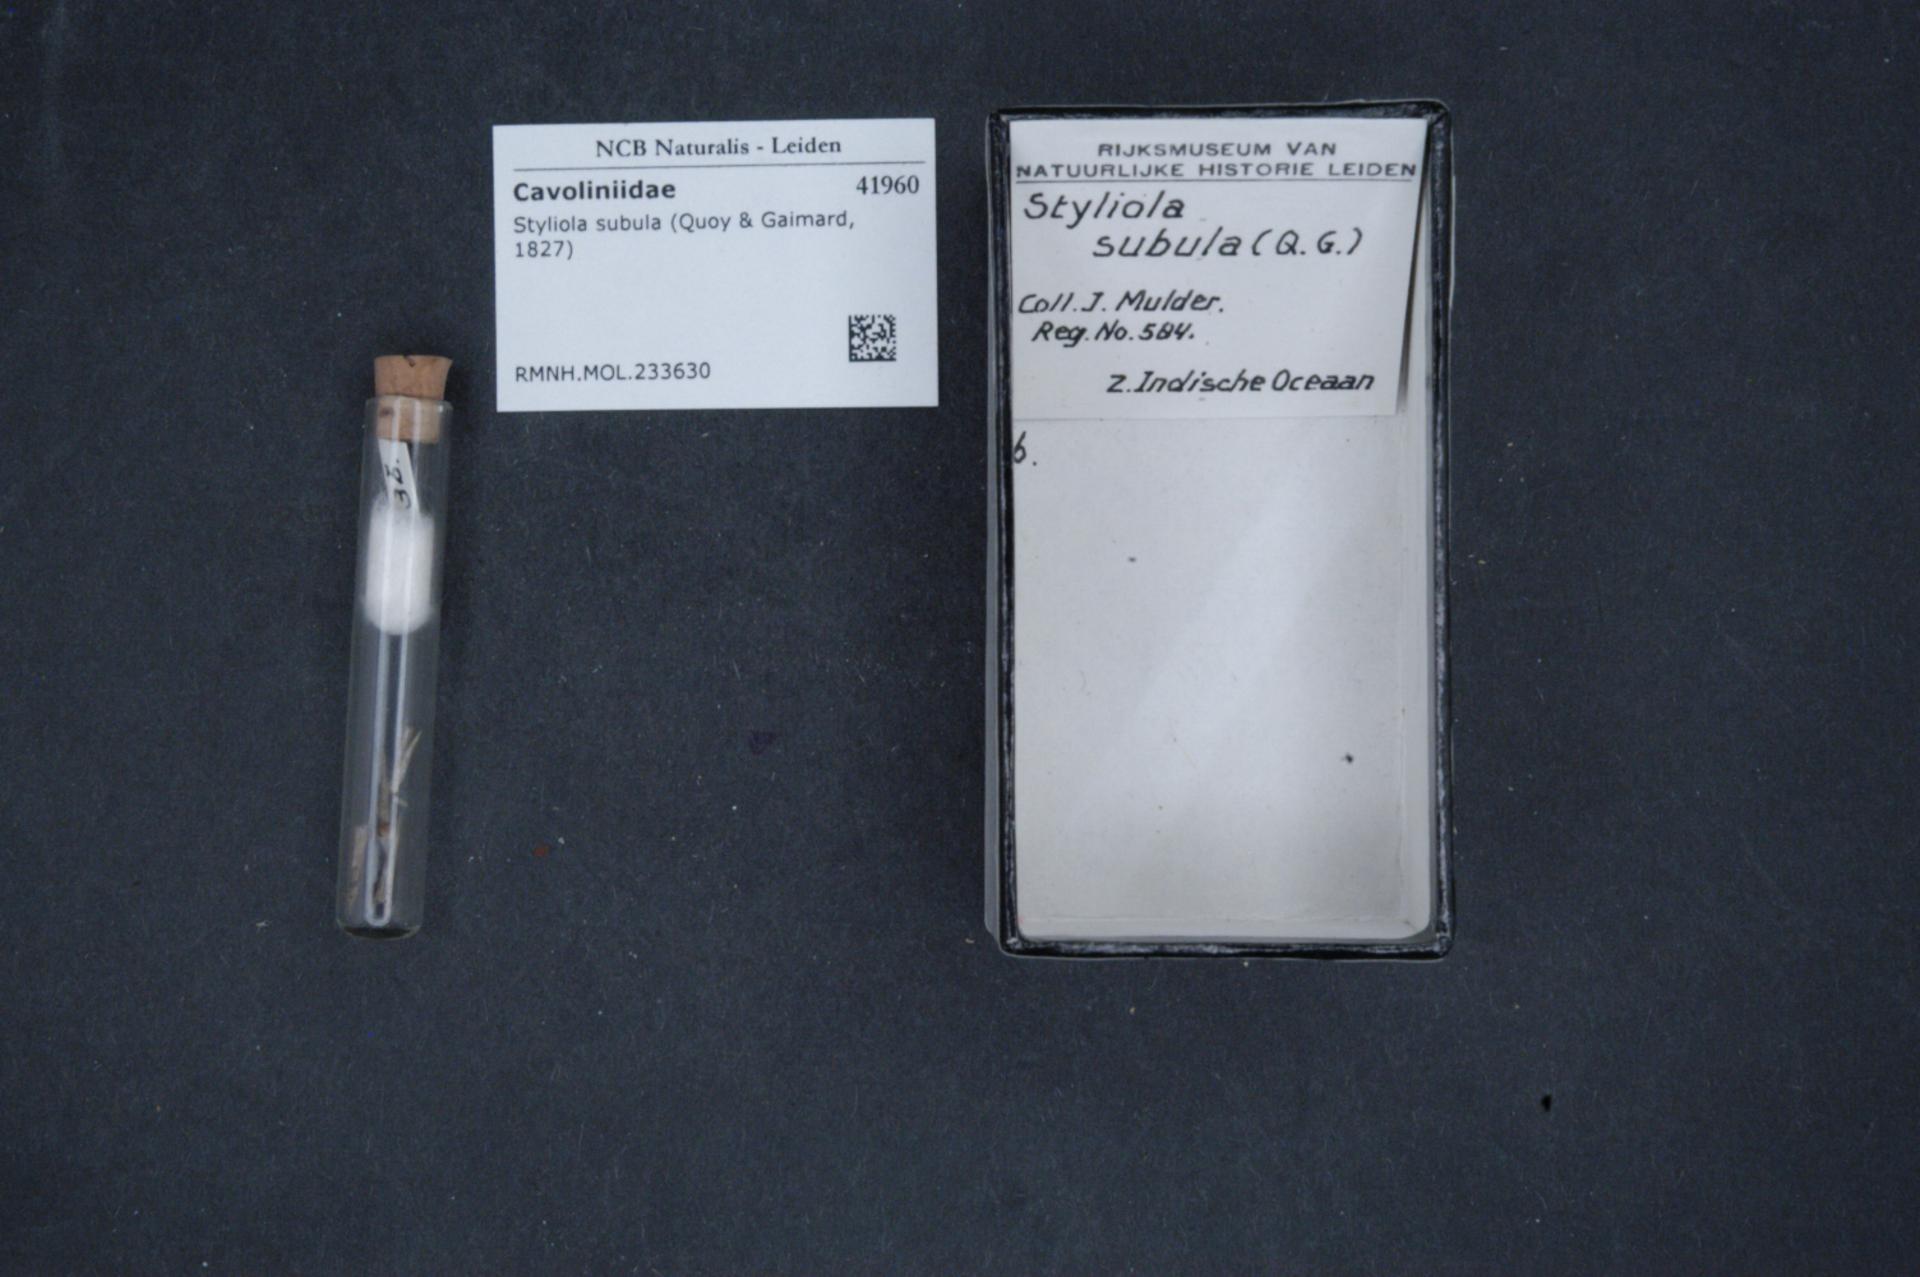 RMNH.MOL.233630 | Styliola subula (Quoy & Gaimard, 1827)